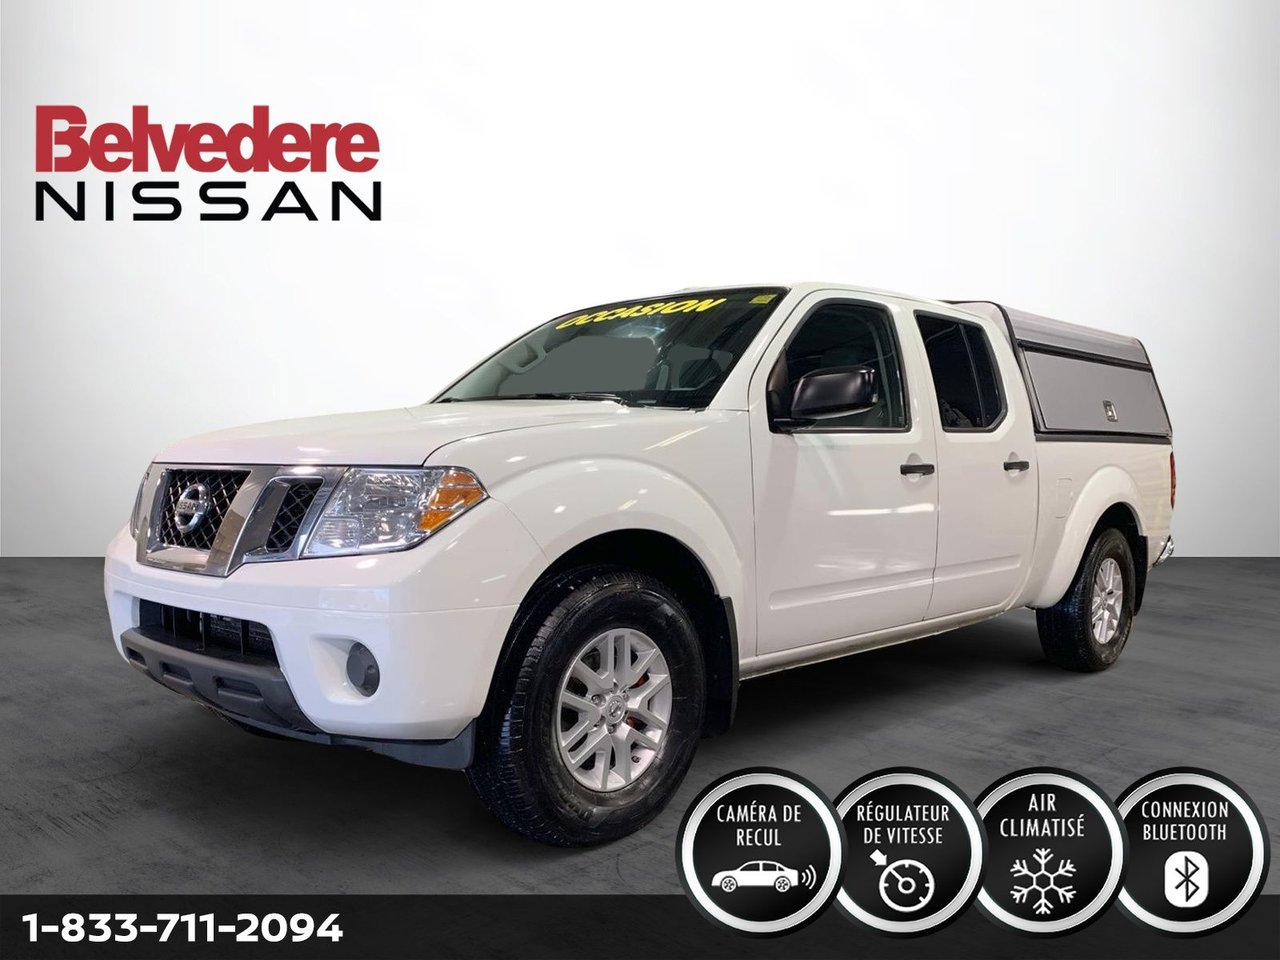 Nissan Frontier 2018 SV 4X4 AUTOMATIQUE CAMERA DE RECUL BLUETOOTH